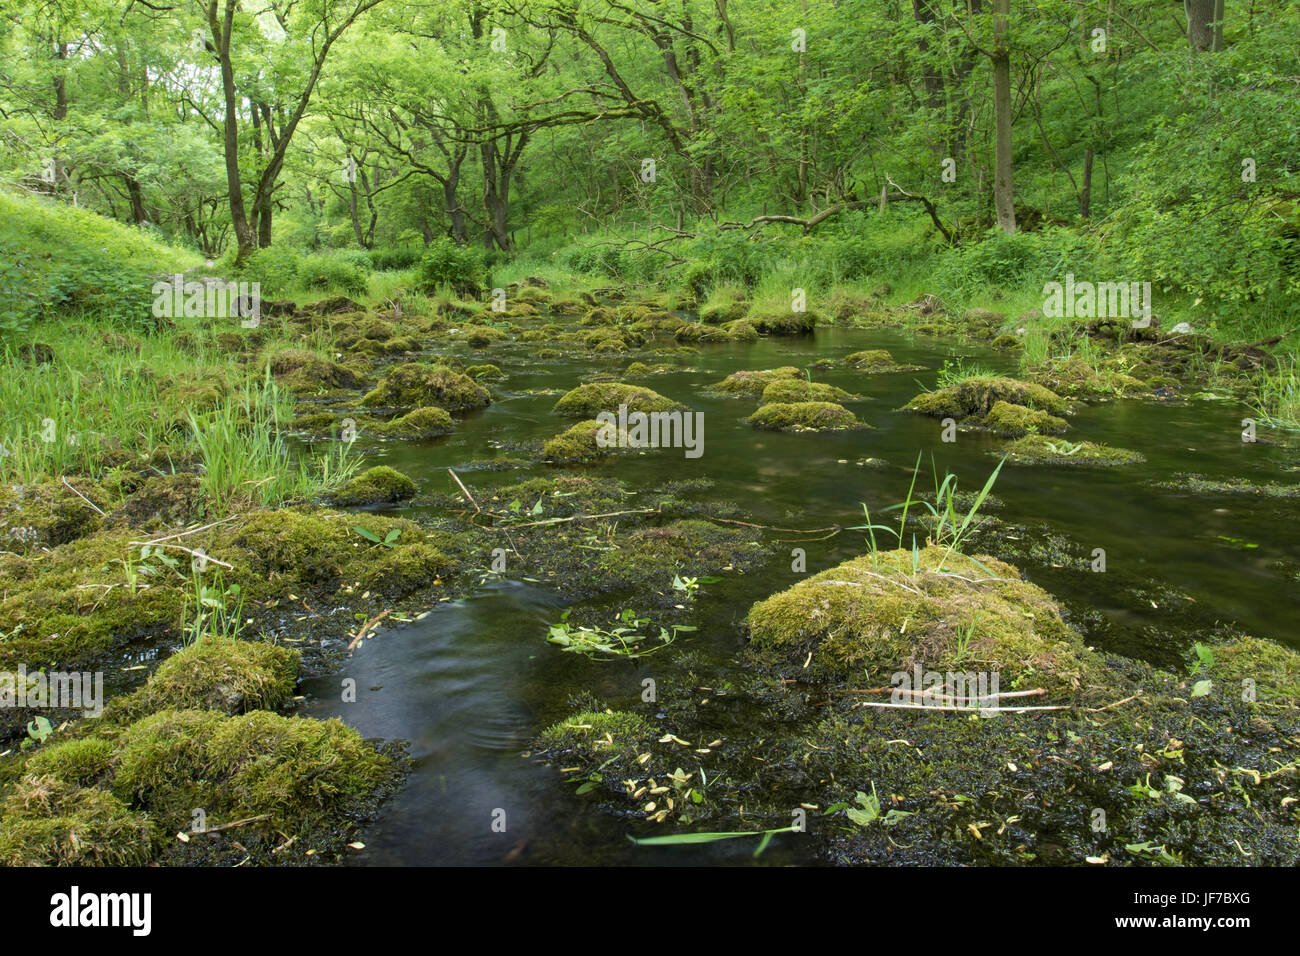 Üppige Frühsommer Vegetation entlang dem Fluß Lathkill, Peak District National Park, UK Stockbild